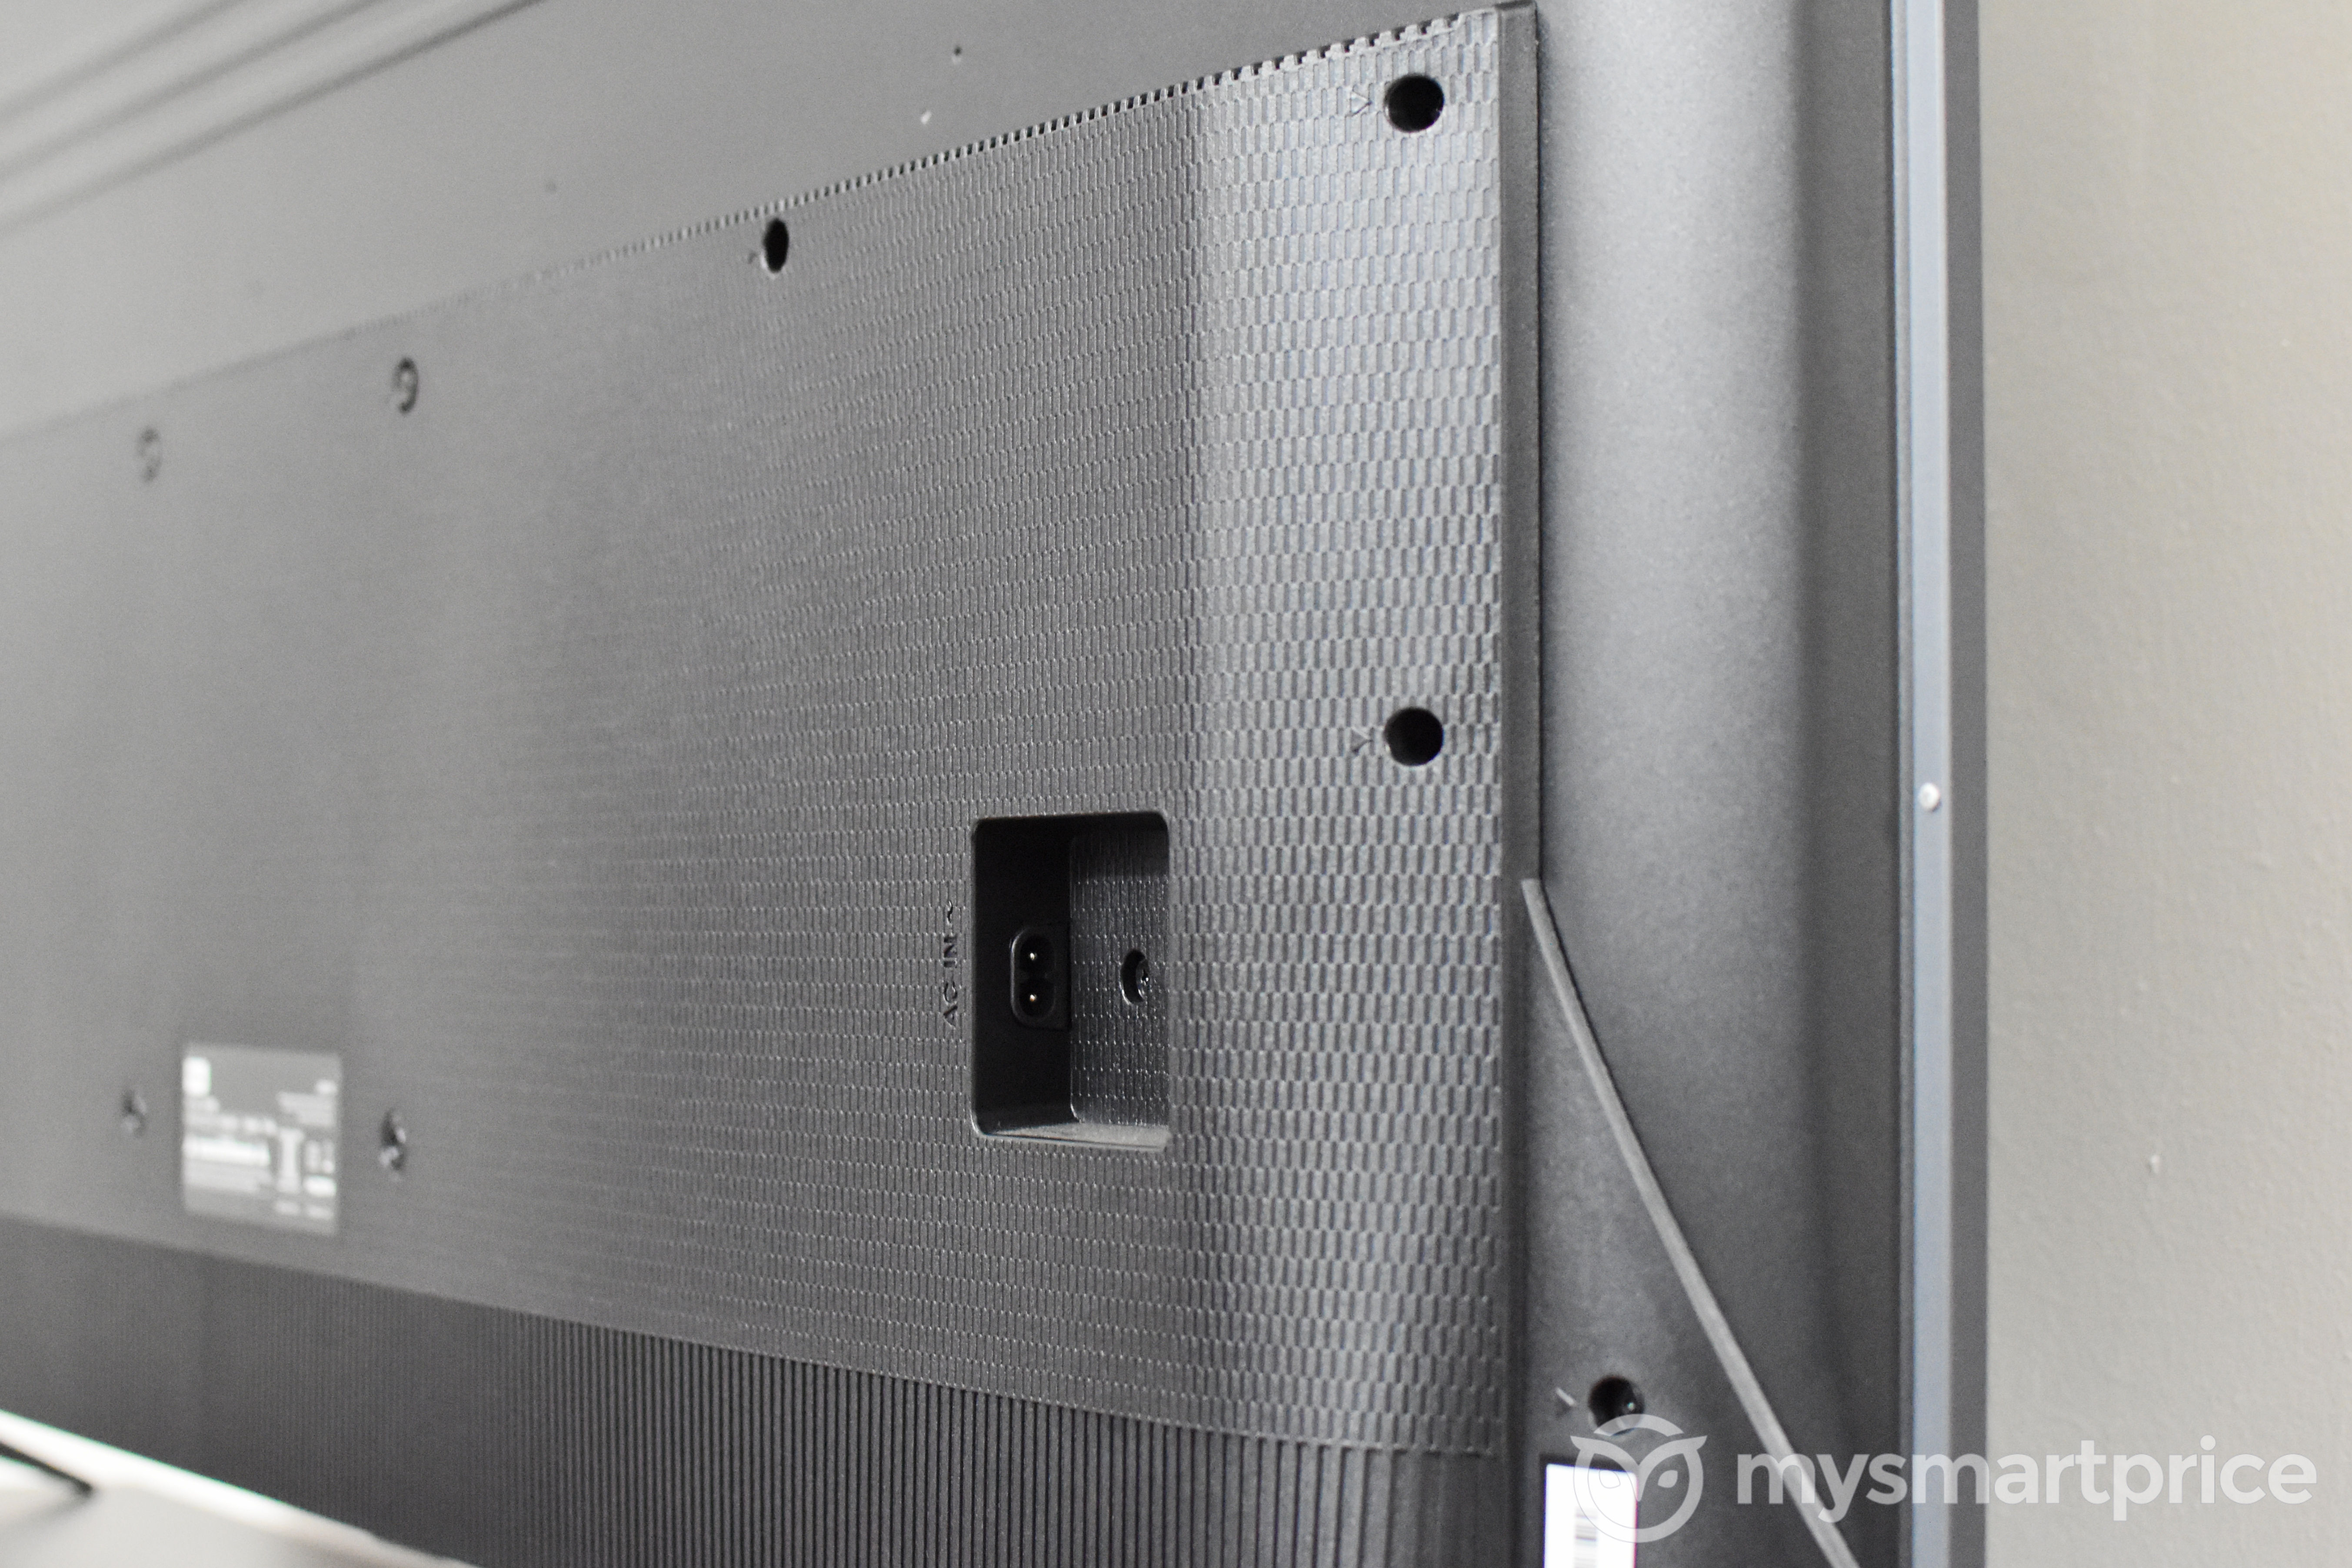 TCL 55P8E Smart 4K HDR TV Review